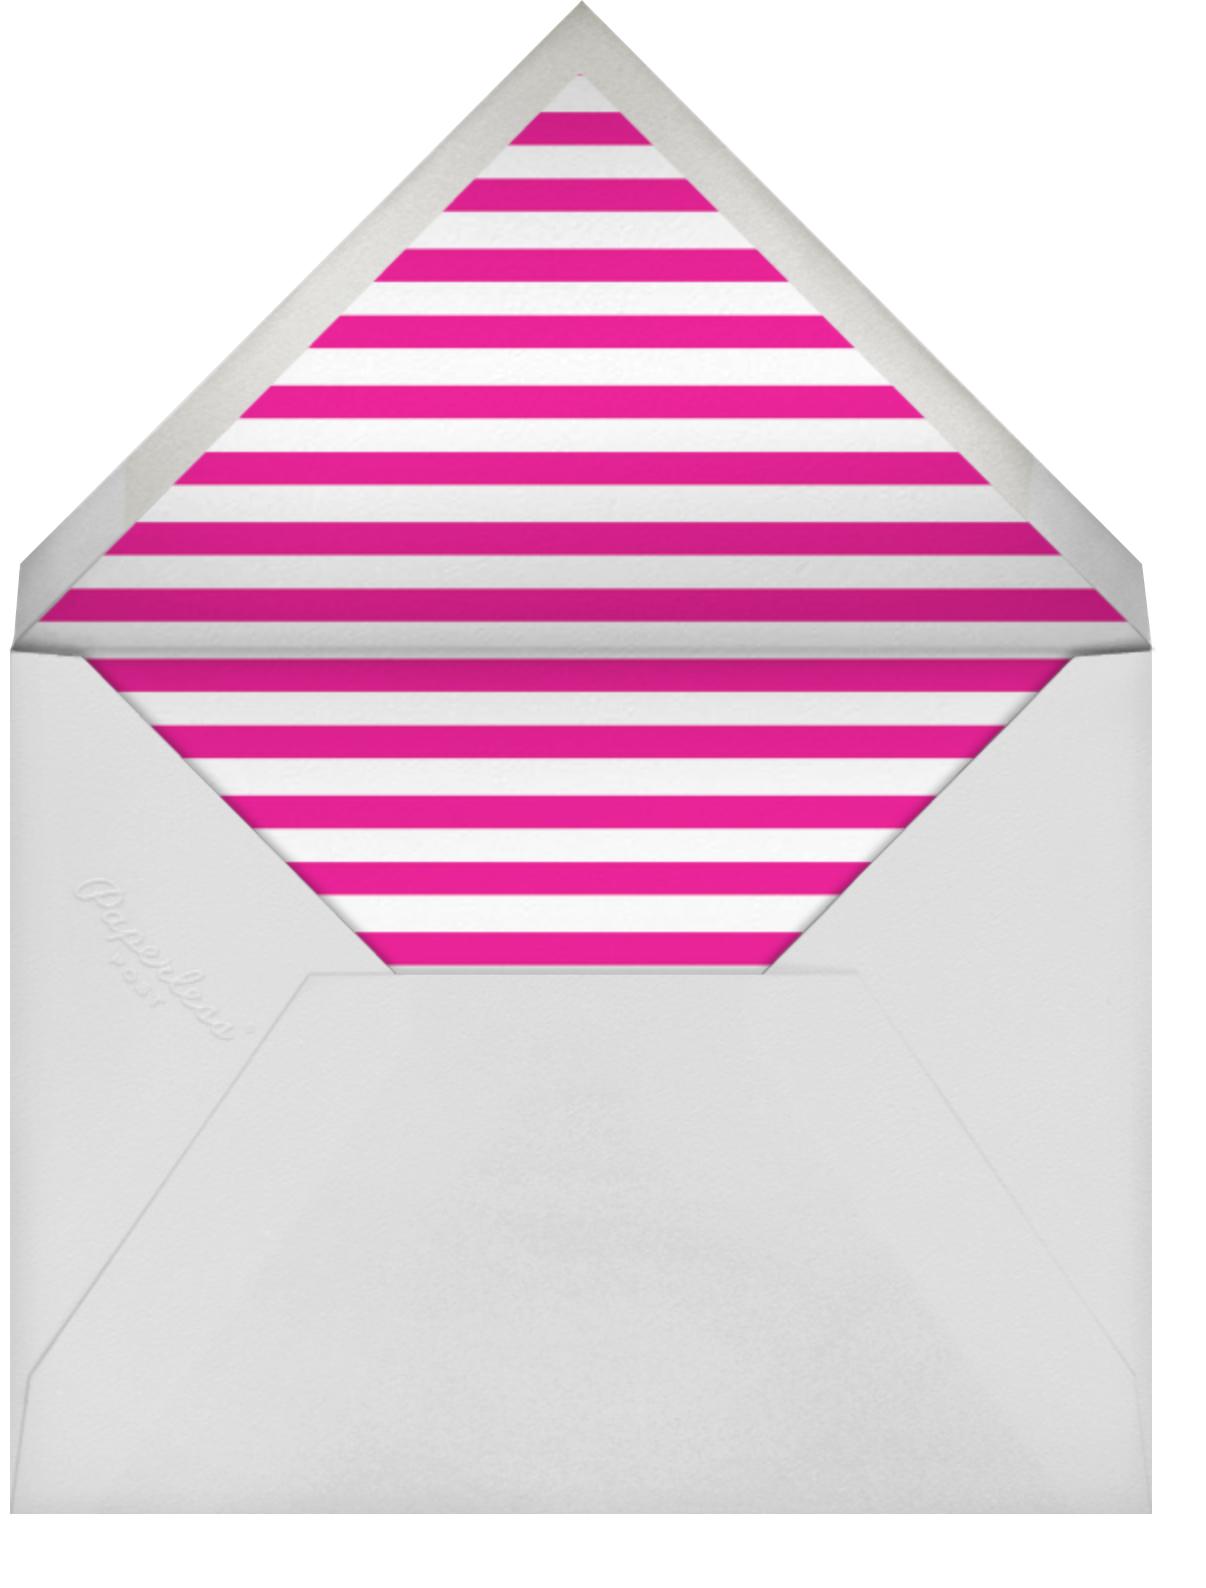 Confetti - Bright Pink/Gold - kate spade new york - Quinceañera - envelope back